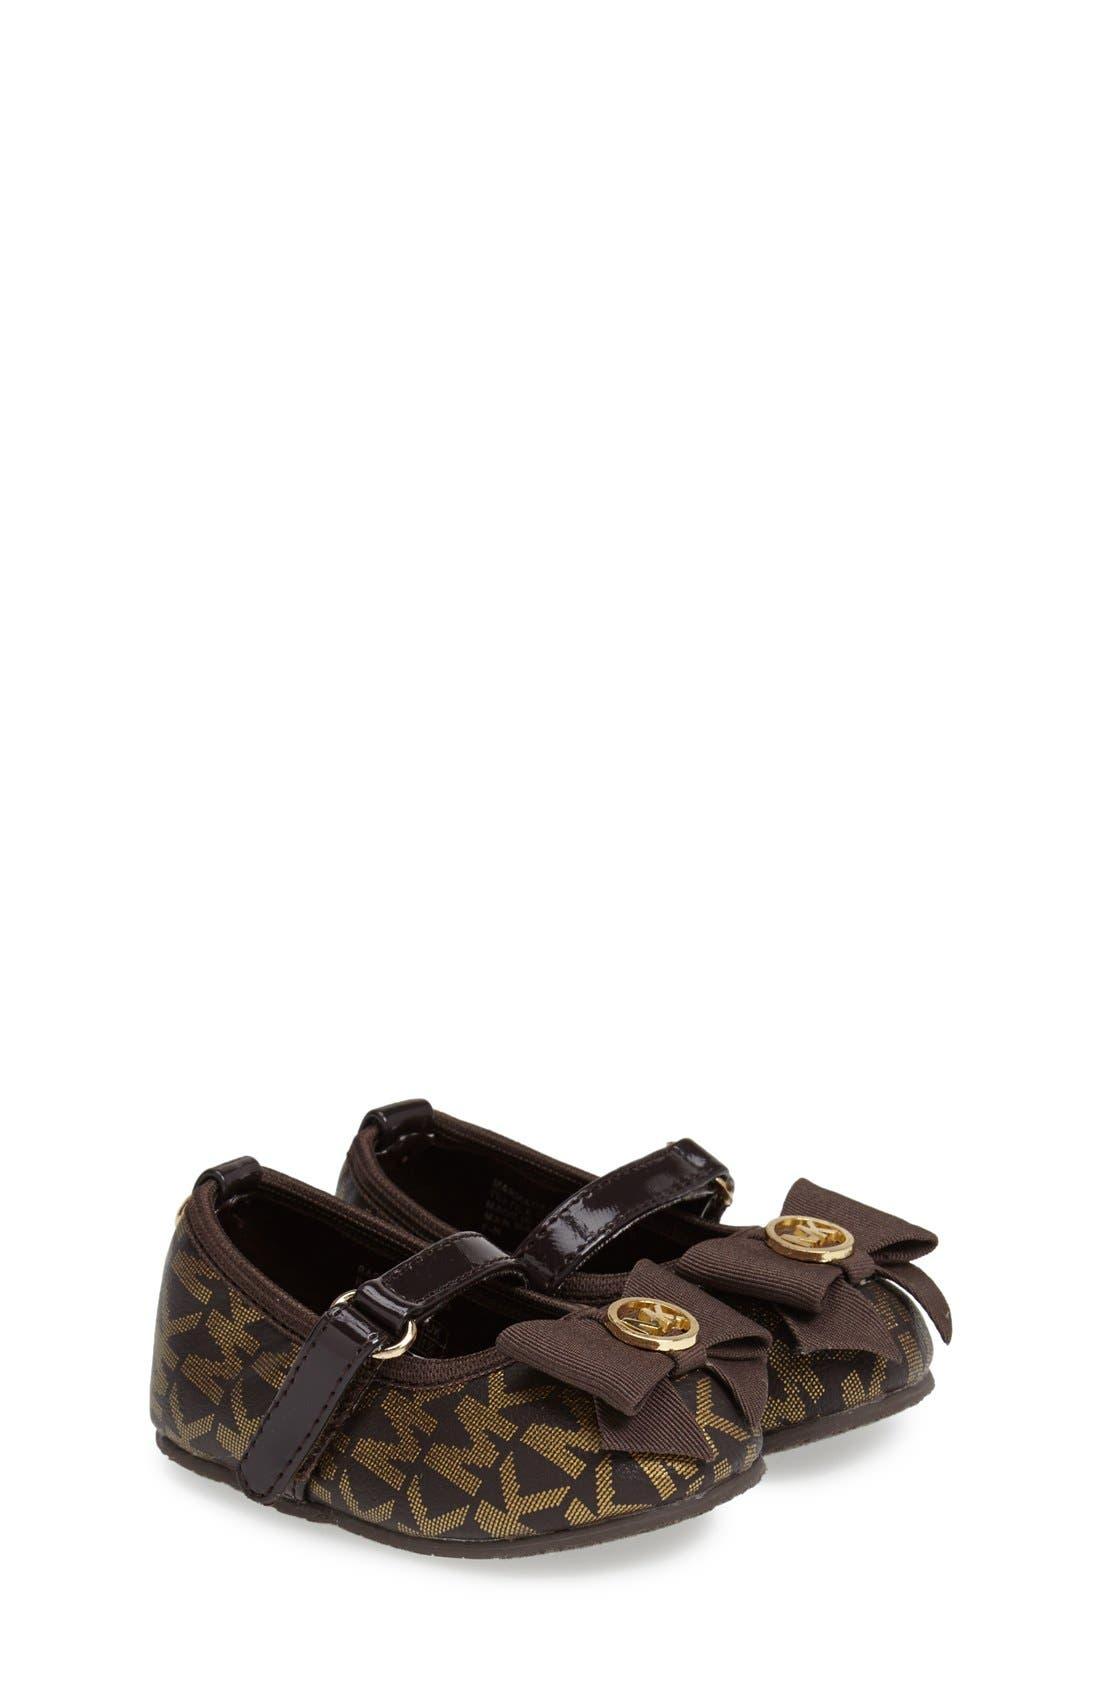 Nordstrom Michael Kors Baby Shoes Style Guru Fashion